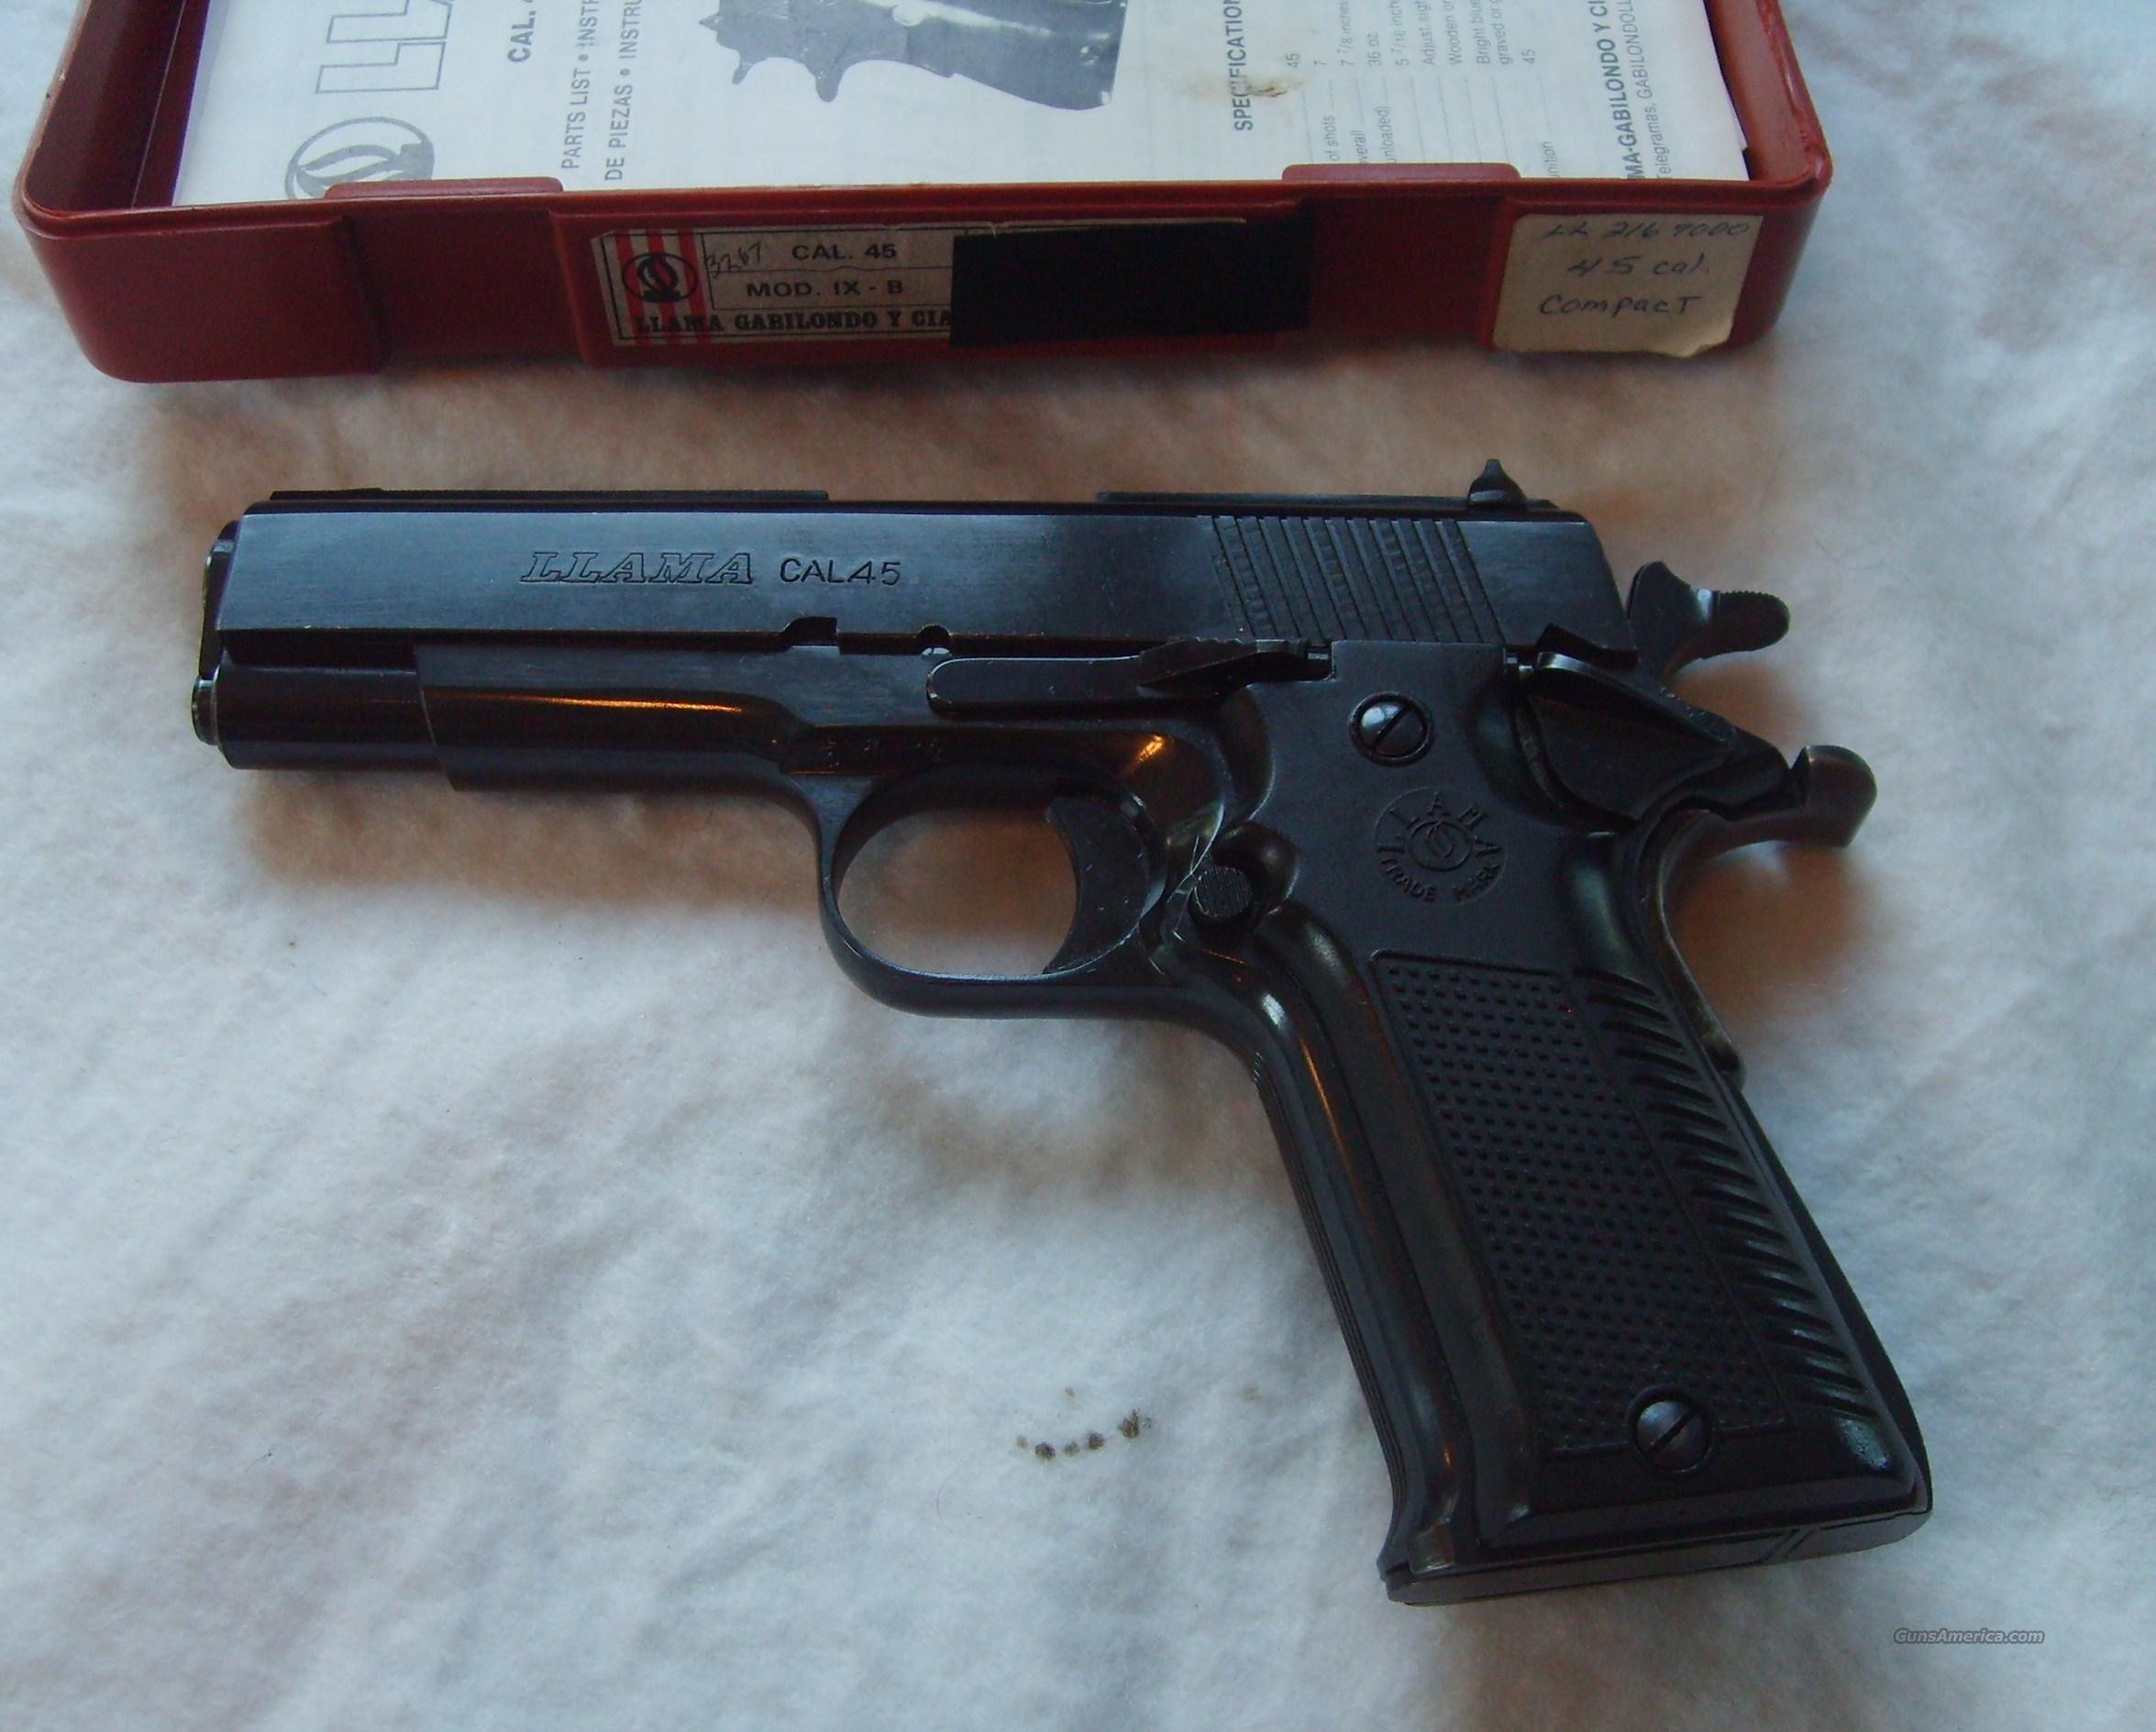 Llama .45 cal Compact Guns > Pistols > Llama Pistols